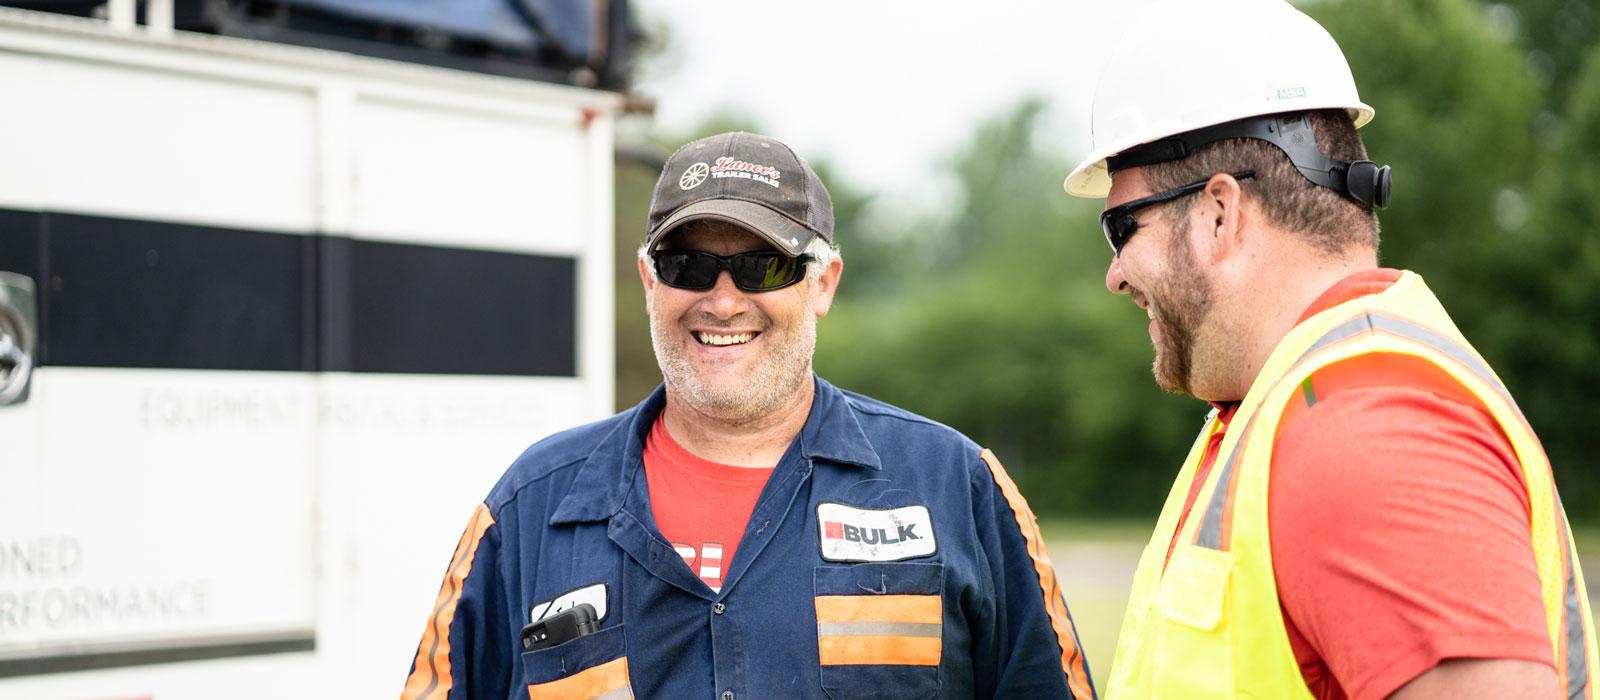 Two Bulk Employees Smiling